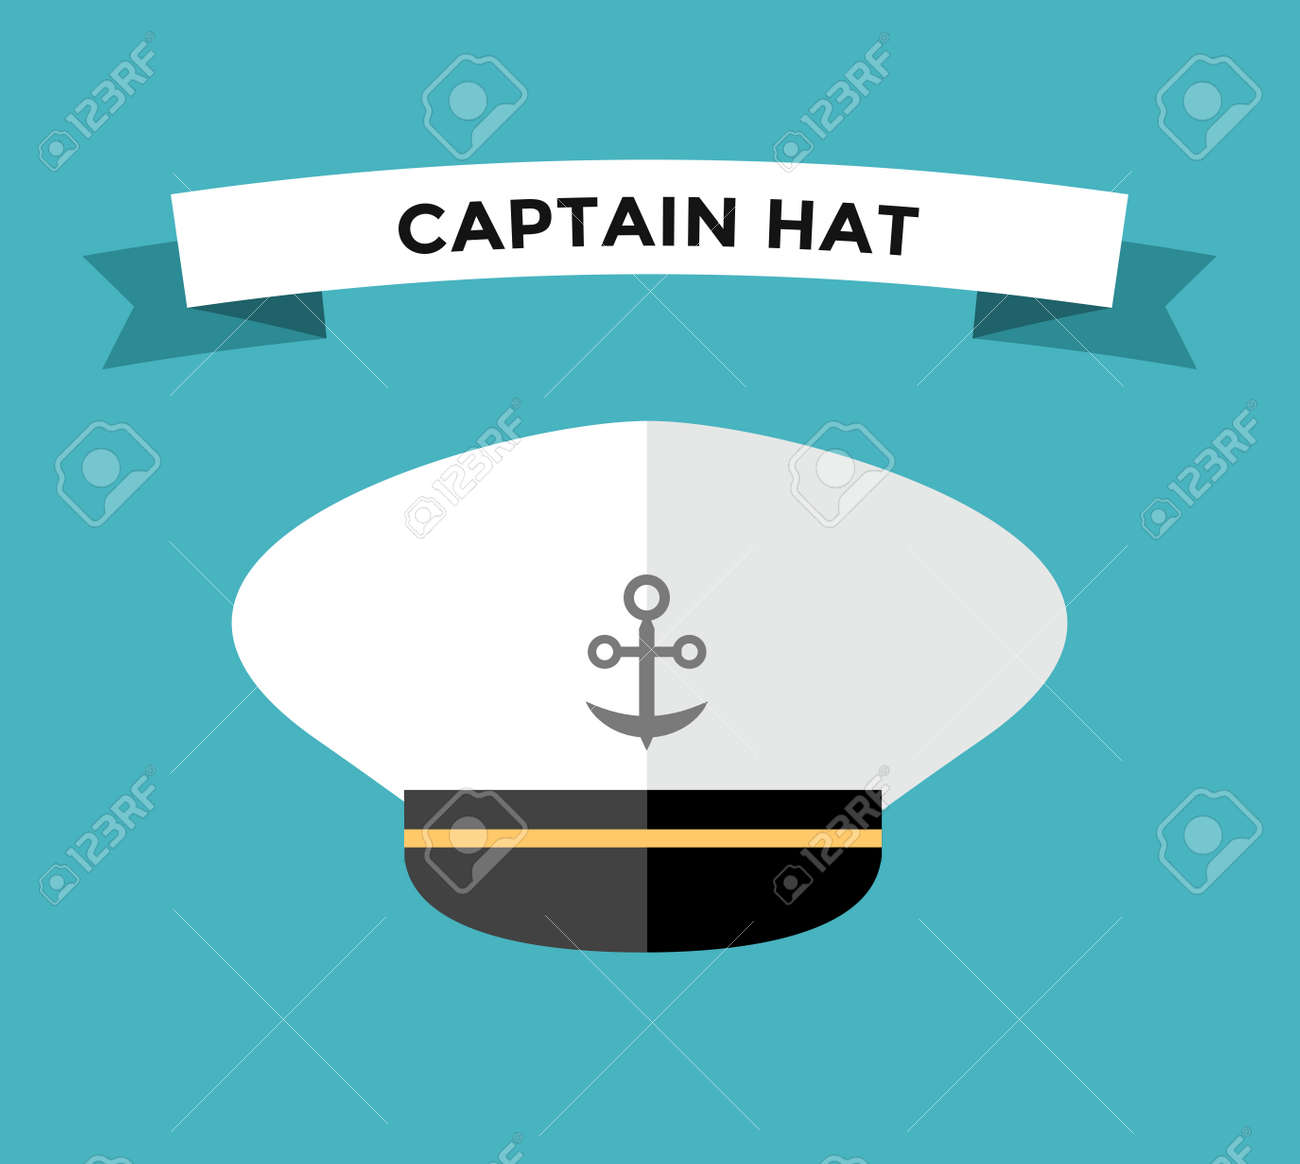 Captain hat flat vector icon  Sailor cap vector flat icon  Flat